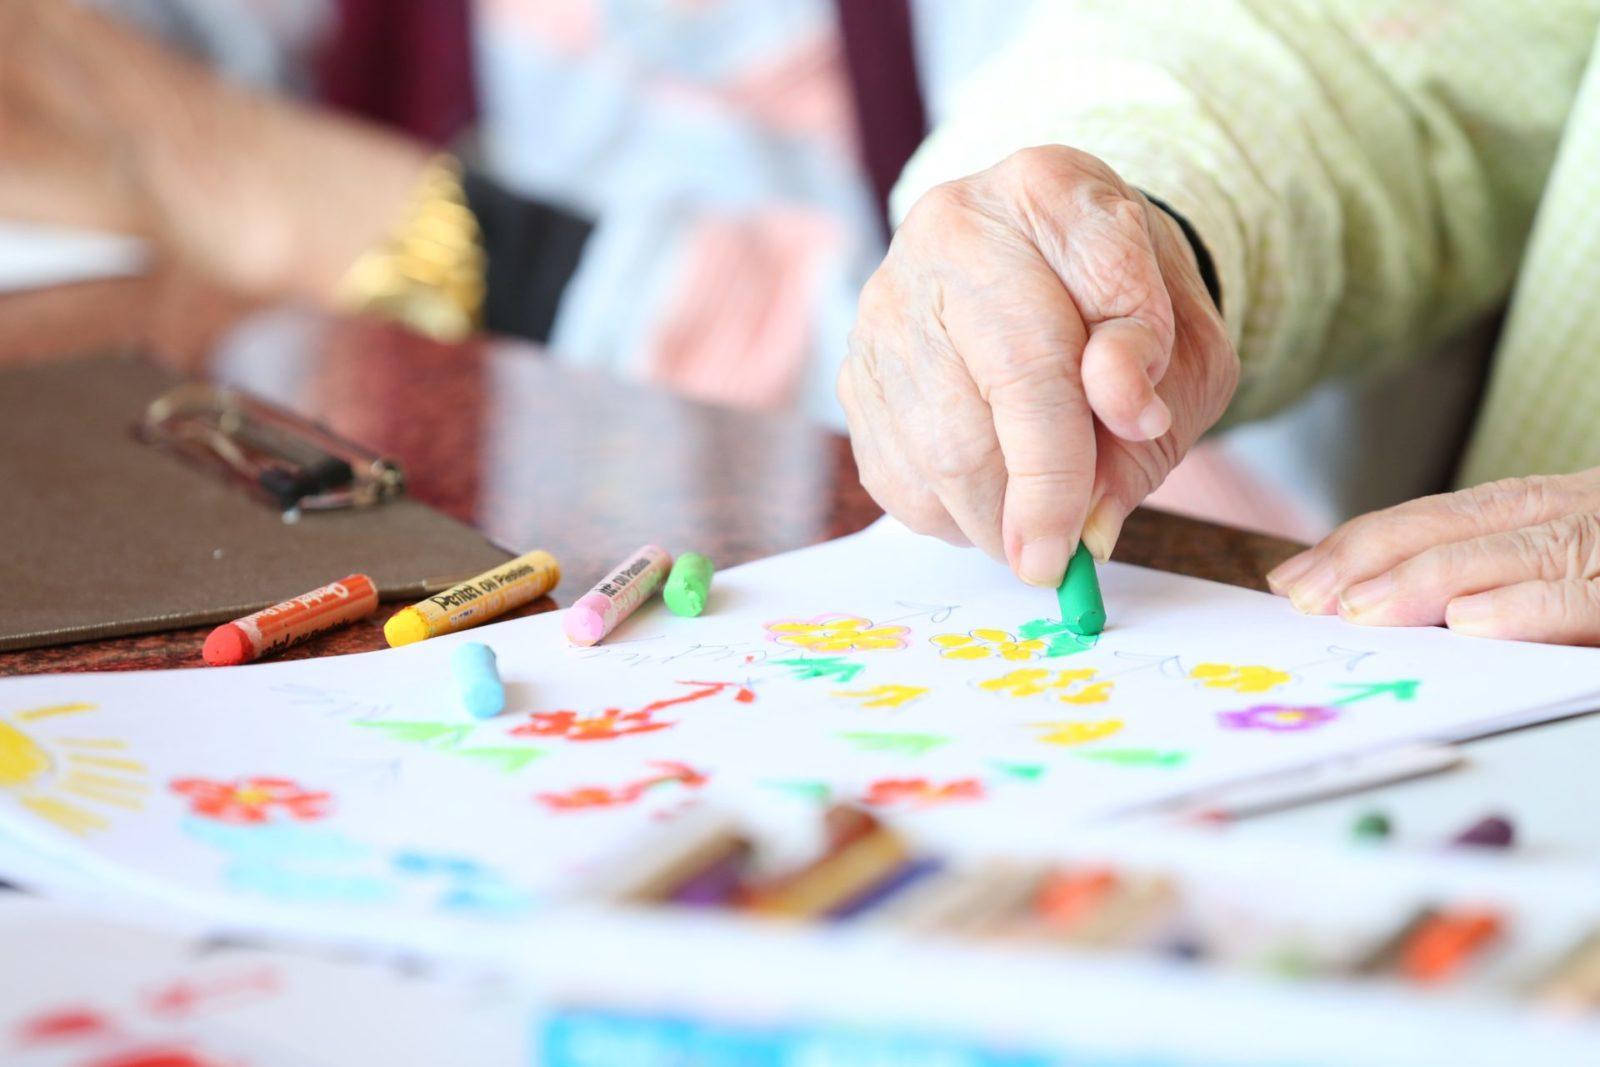 Can osteoarthritis be avoided?